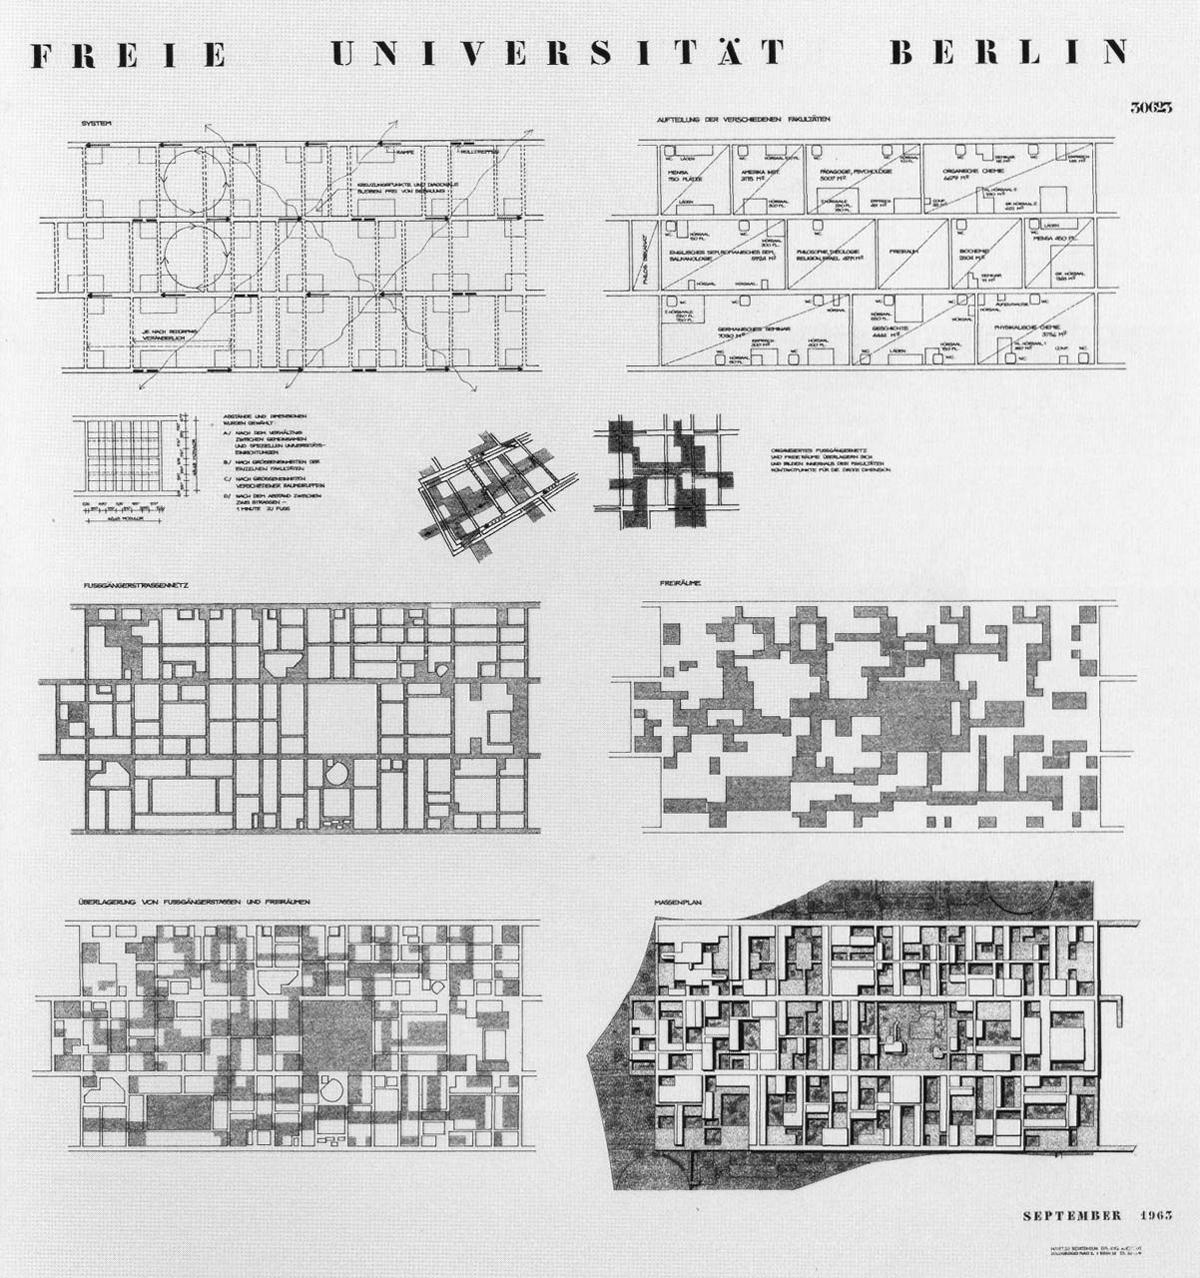 Candilis-Josic-Woods > Free University Berlin